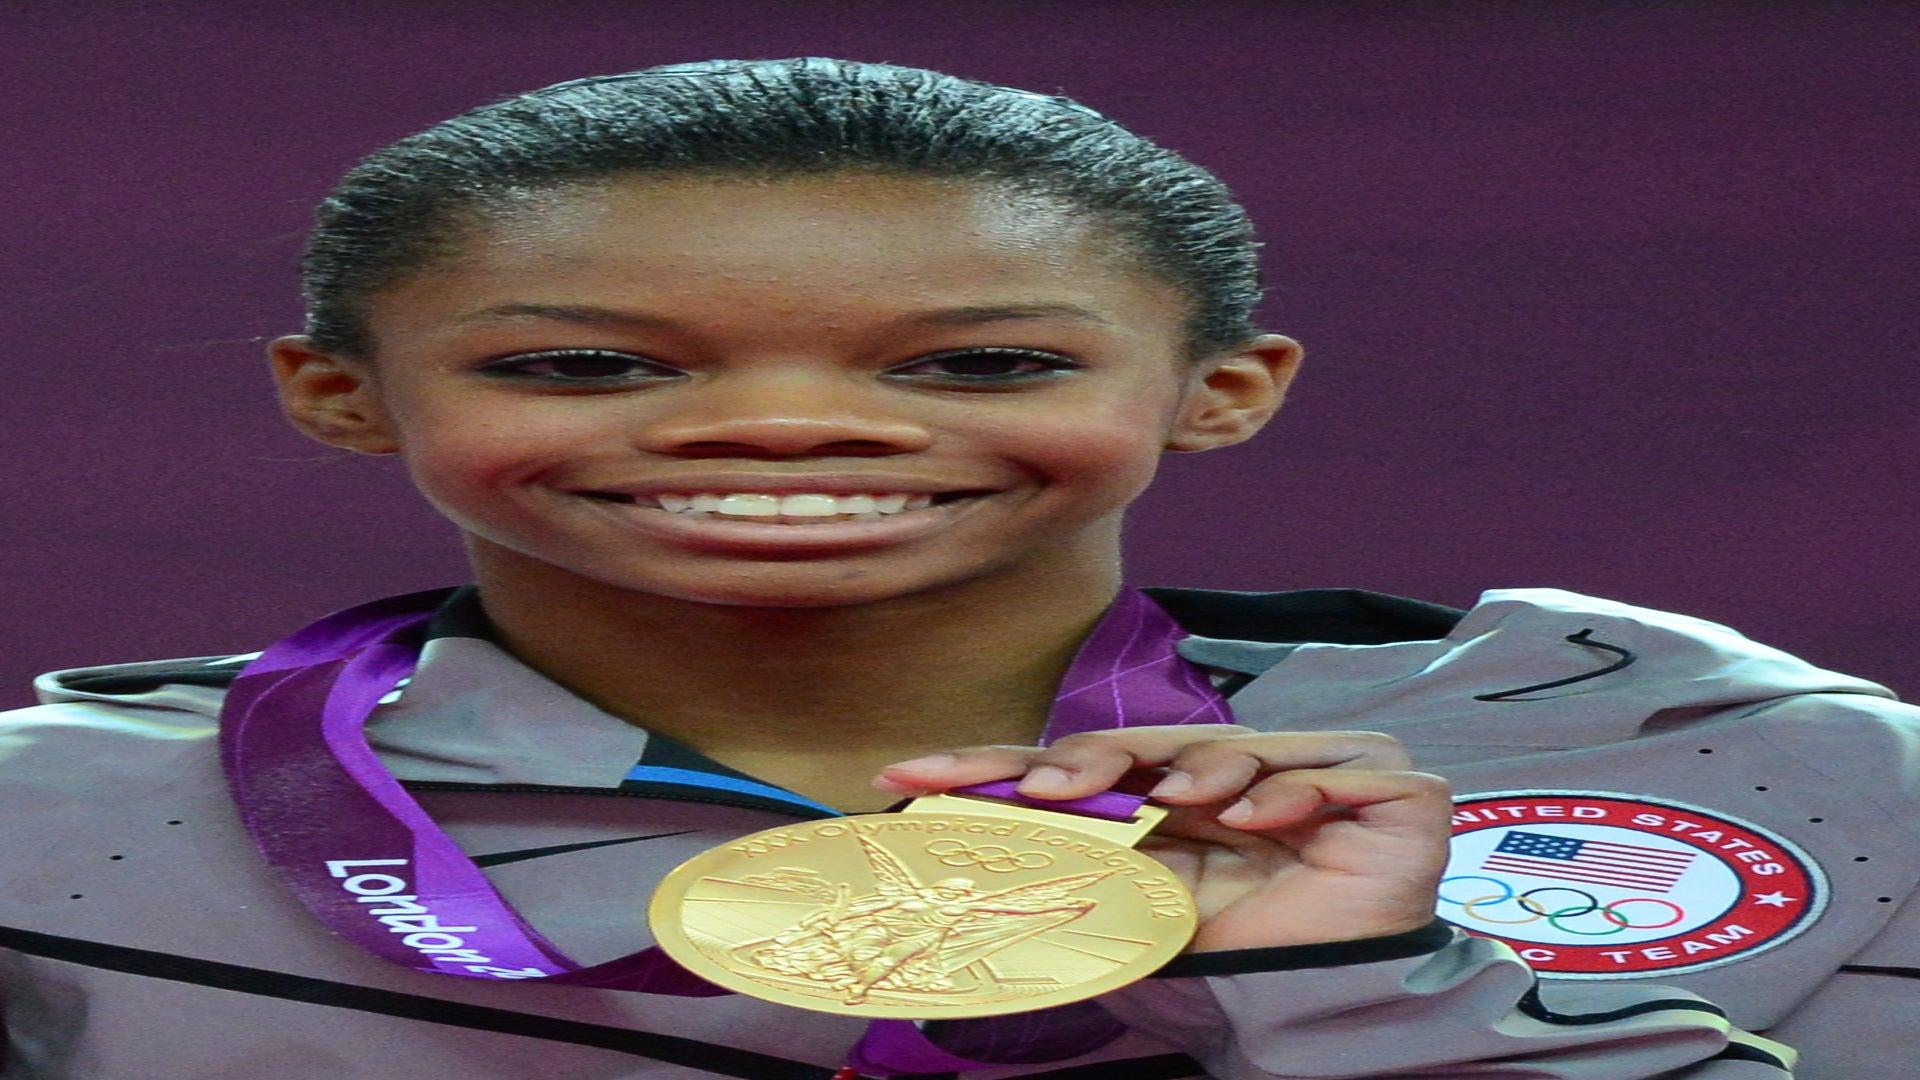 Spoiler Alert: Gabby Douglas Wins Gold in the Gymnastics All-Around Final